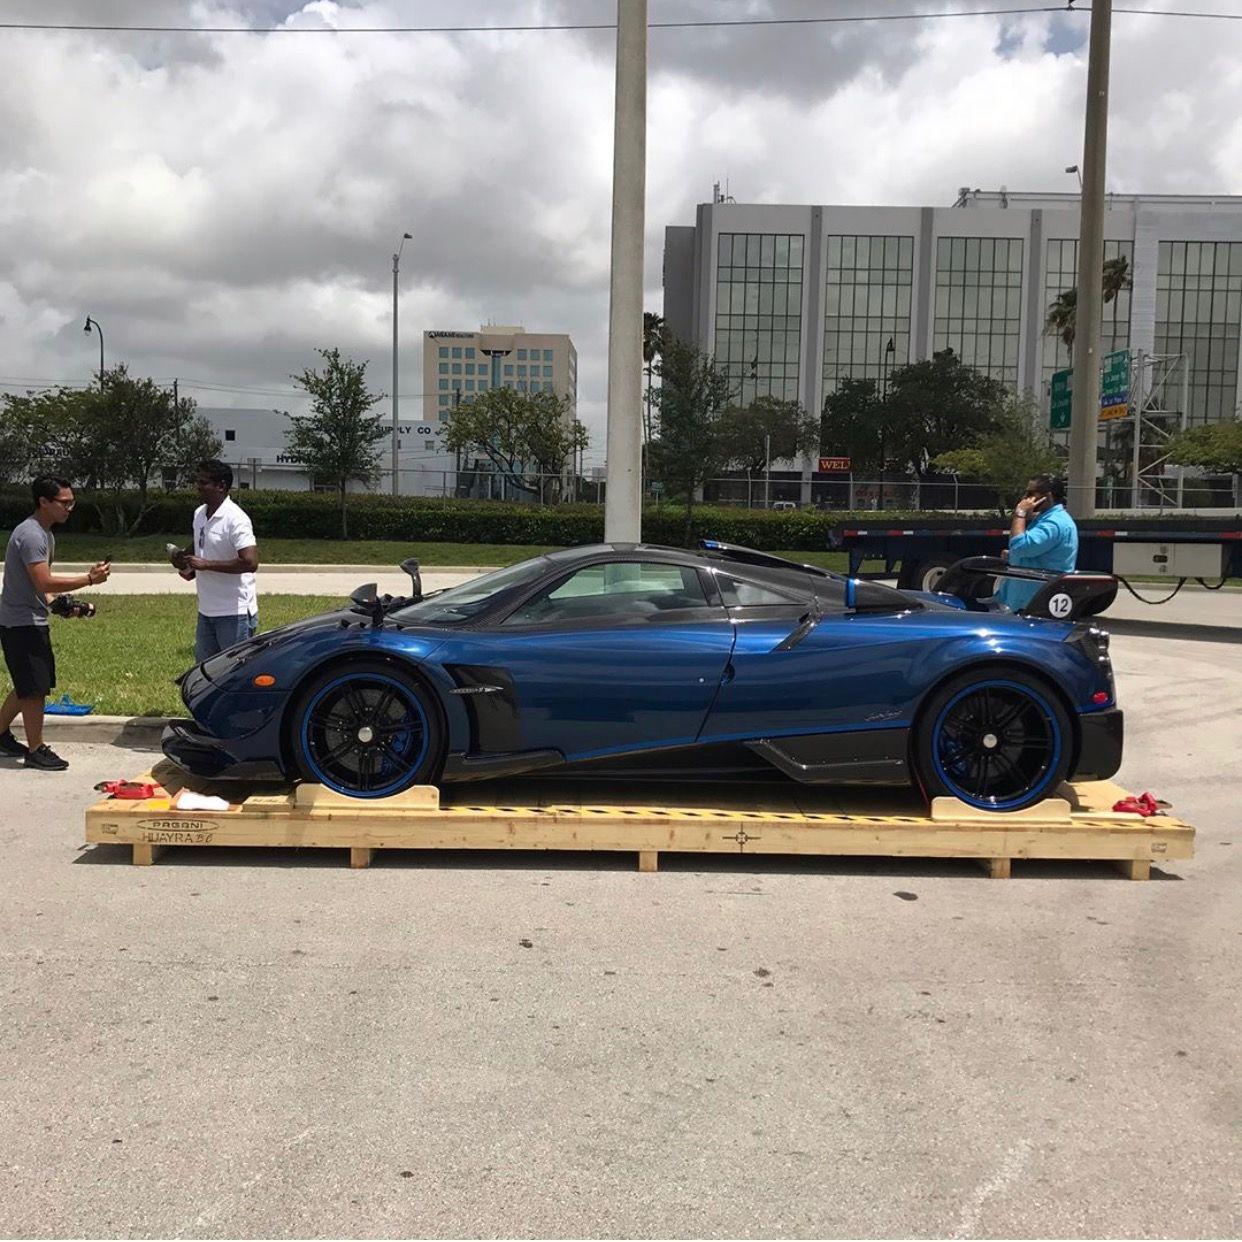 Pagani Huayra Bc Macchina Volante Made Out Of Exposed Blue And